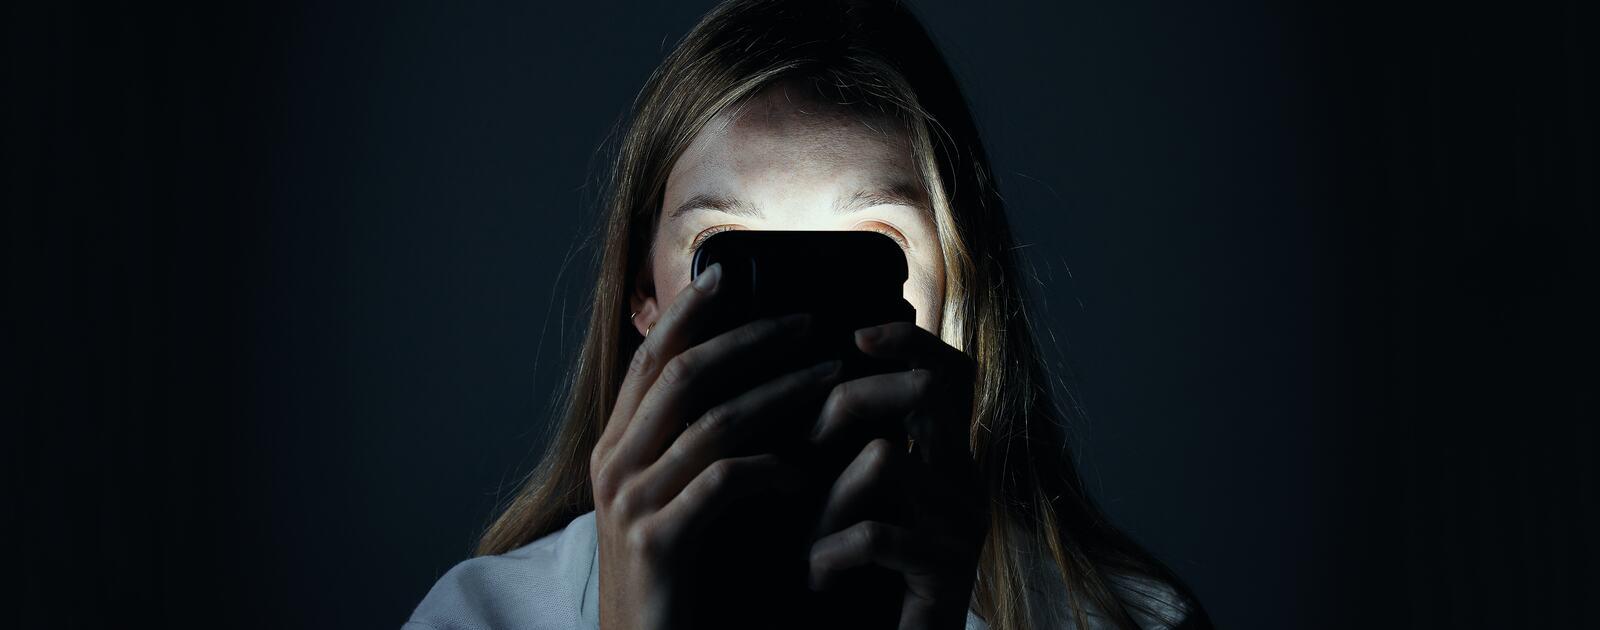 A girl behind a phone screen